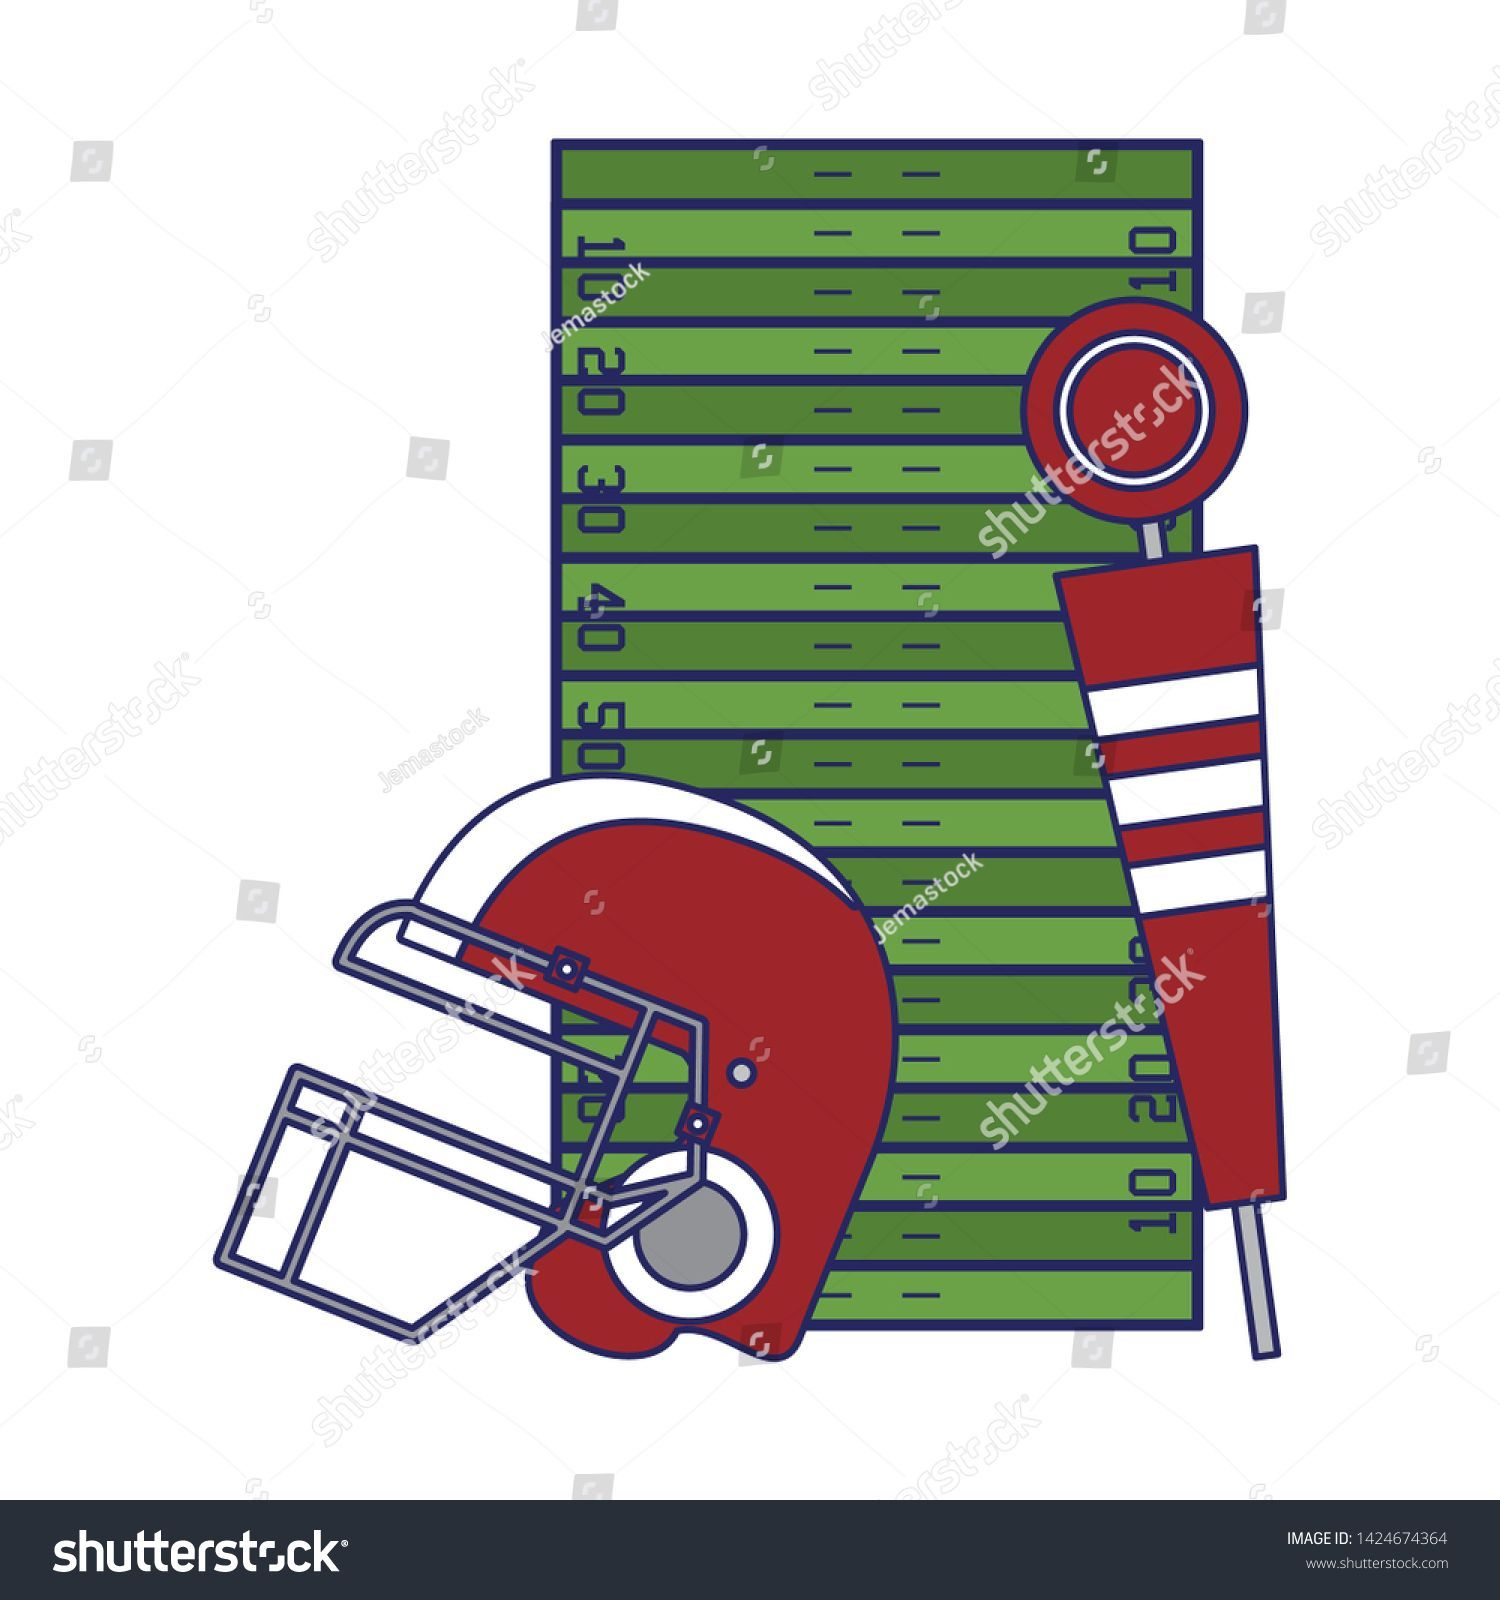 American Football Sport Helmet Pitch Marker Stock Vector Royalty Free 1424674364 American Football Sport Helmet Pitch Marker Stock Vector Royalty Free 1424674364